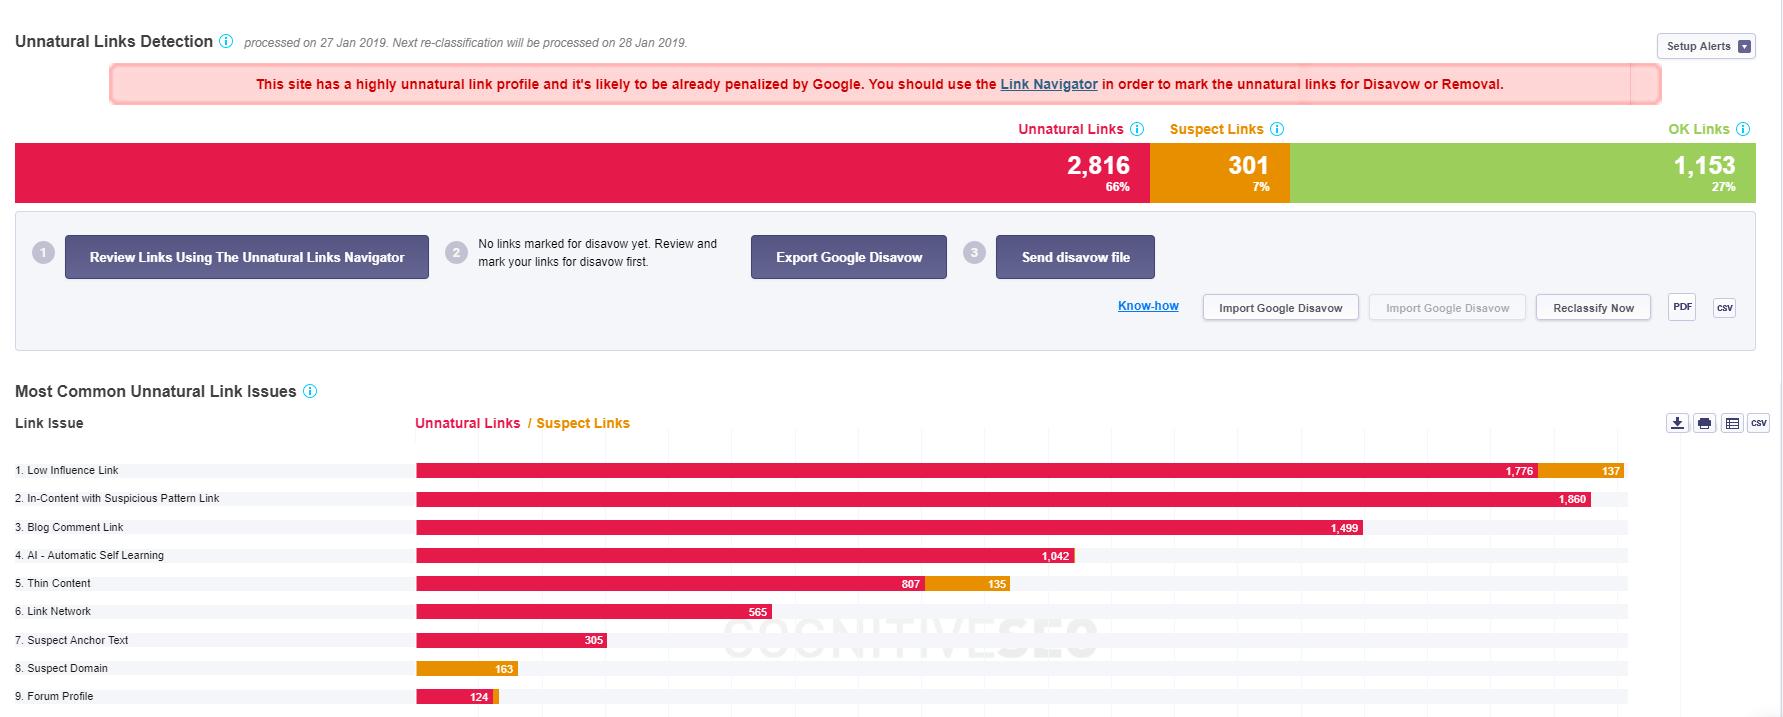 Unnatural Link Detection